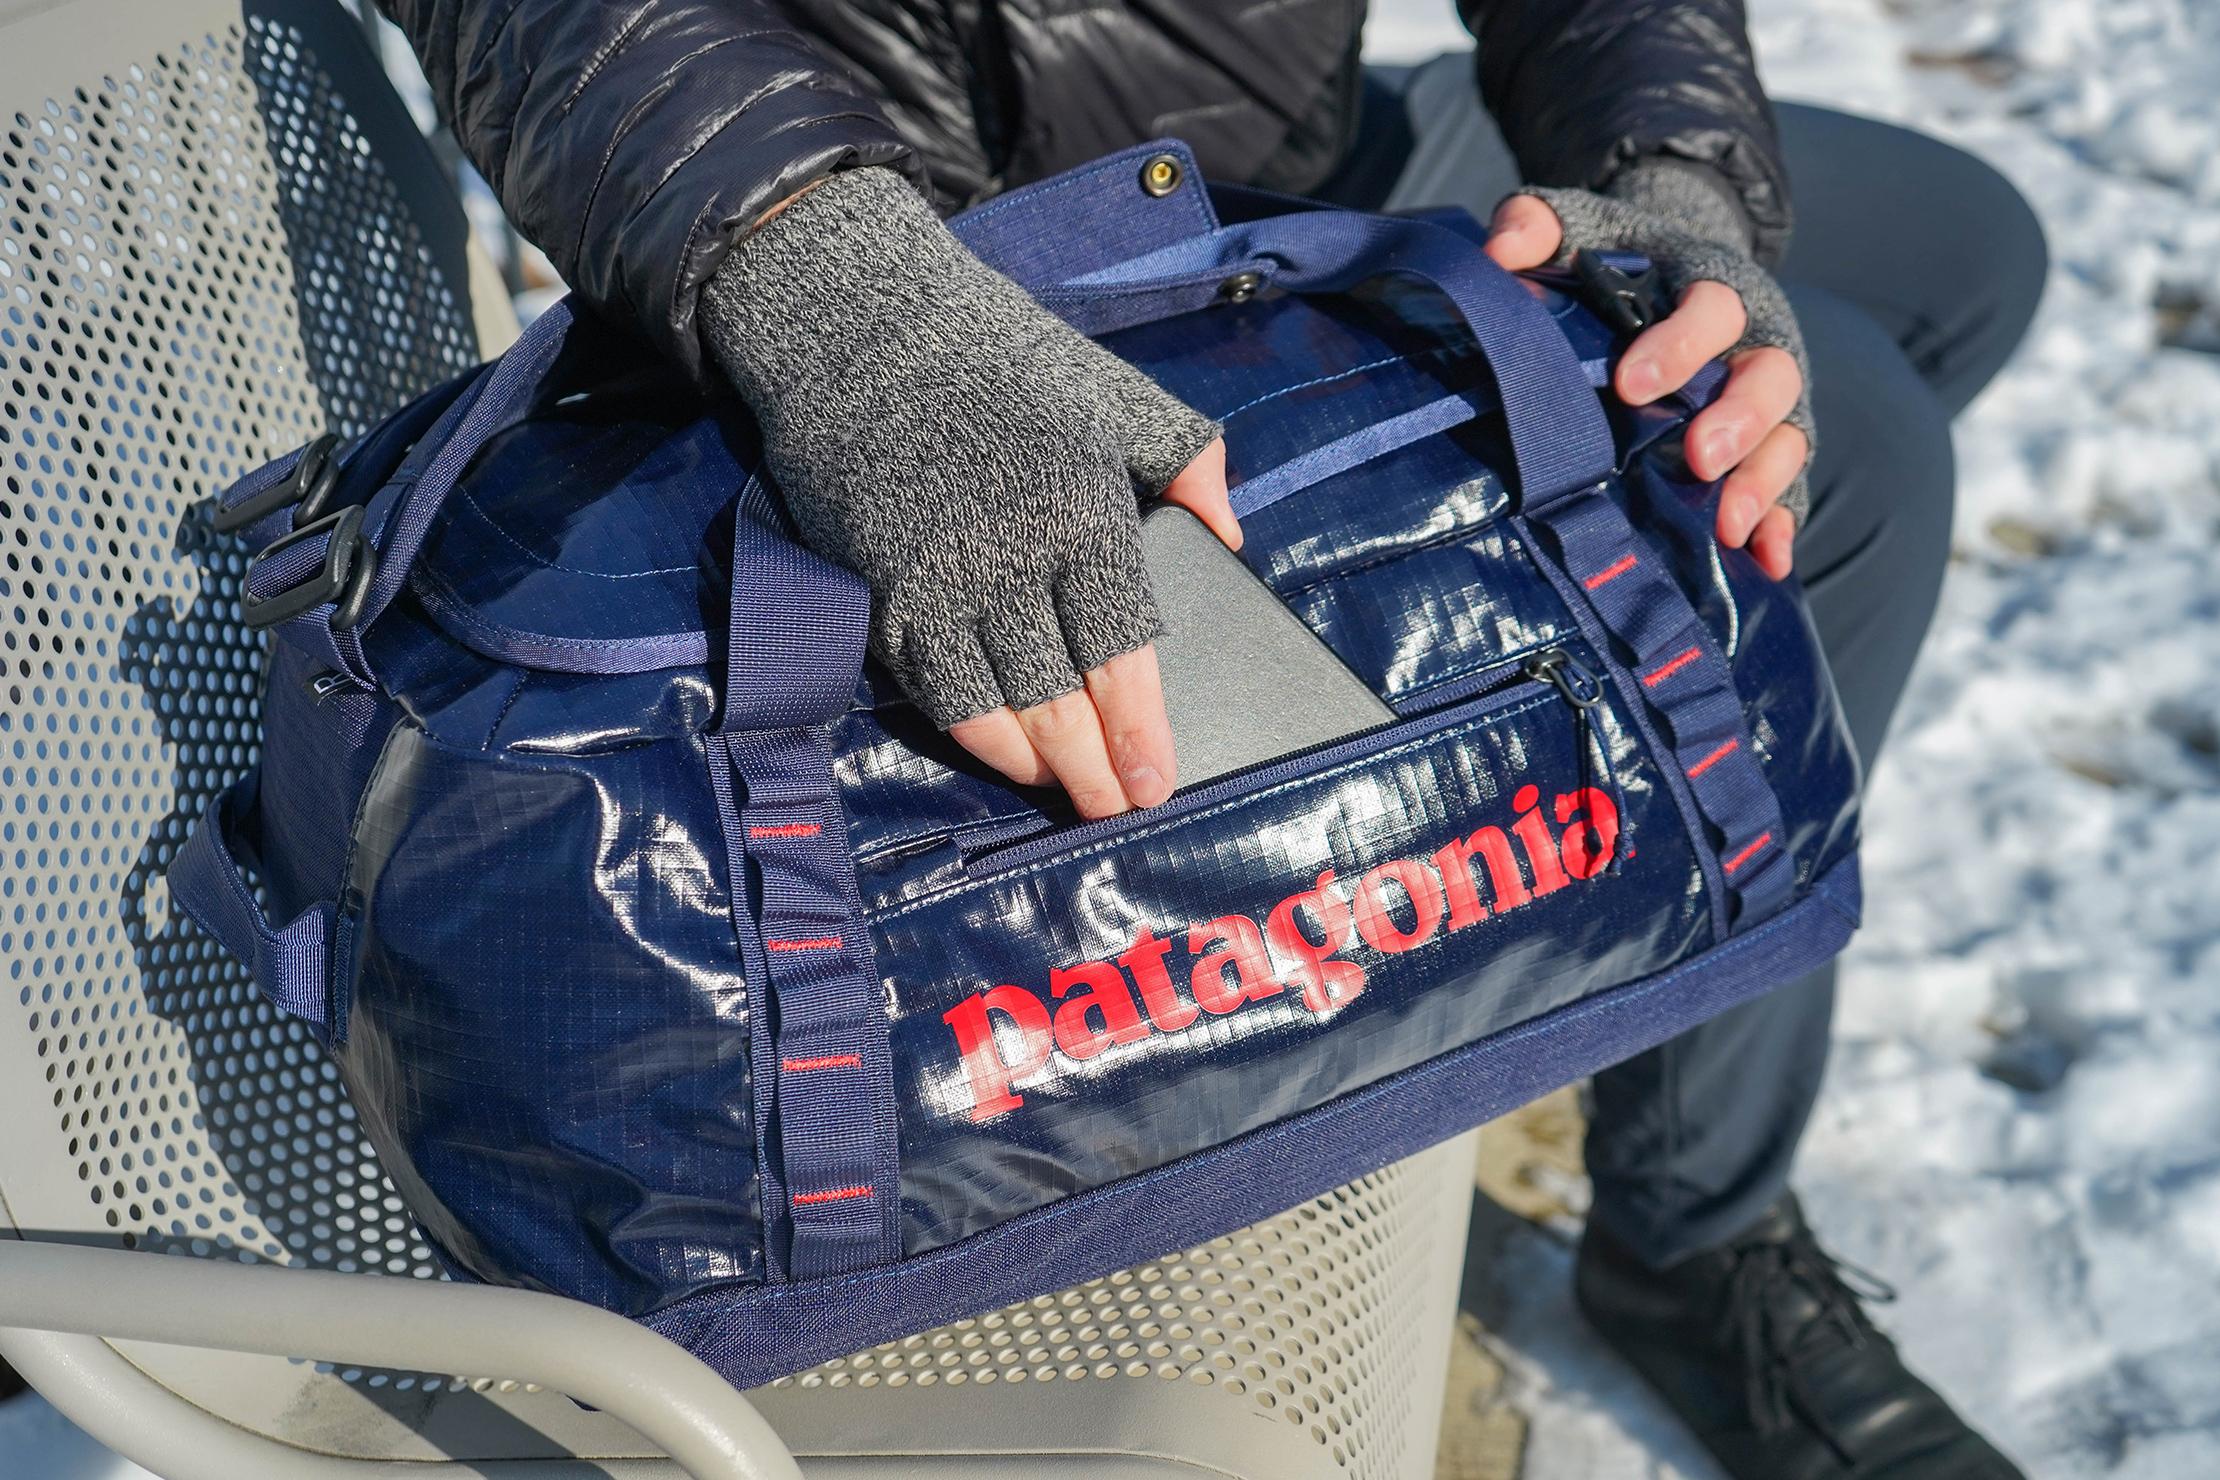 Patagonia Black Hole Duffel Bag 40L In Use